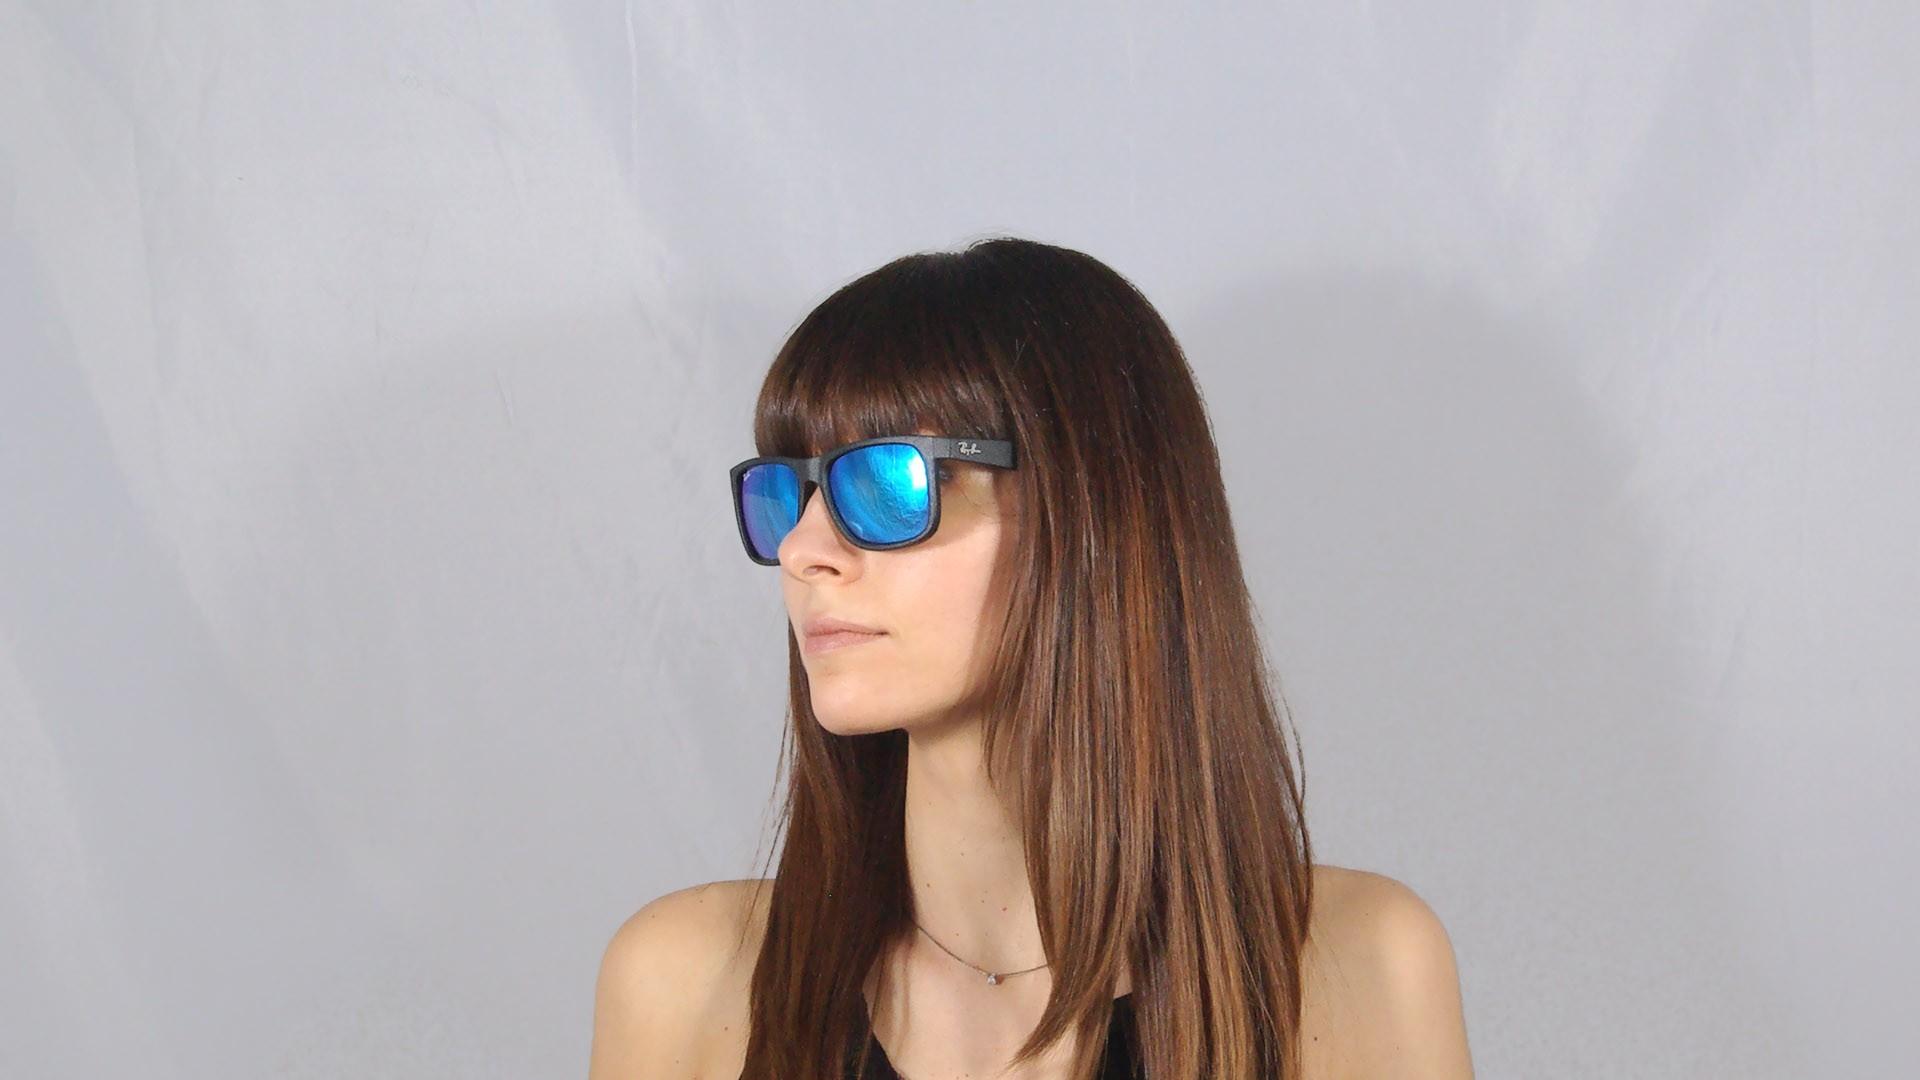 Lunettes de soleil Ray-Ban Justin Noir RB4165 622 55 51-16 Medium Verres  Miroirs Bleus f8b53987b87f